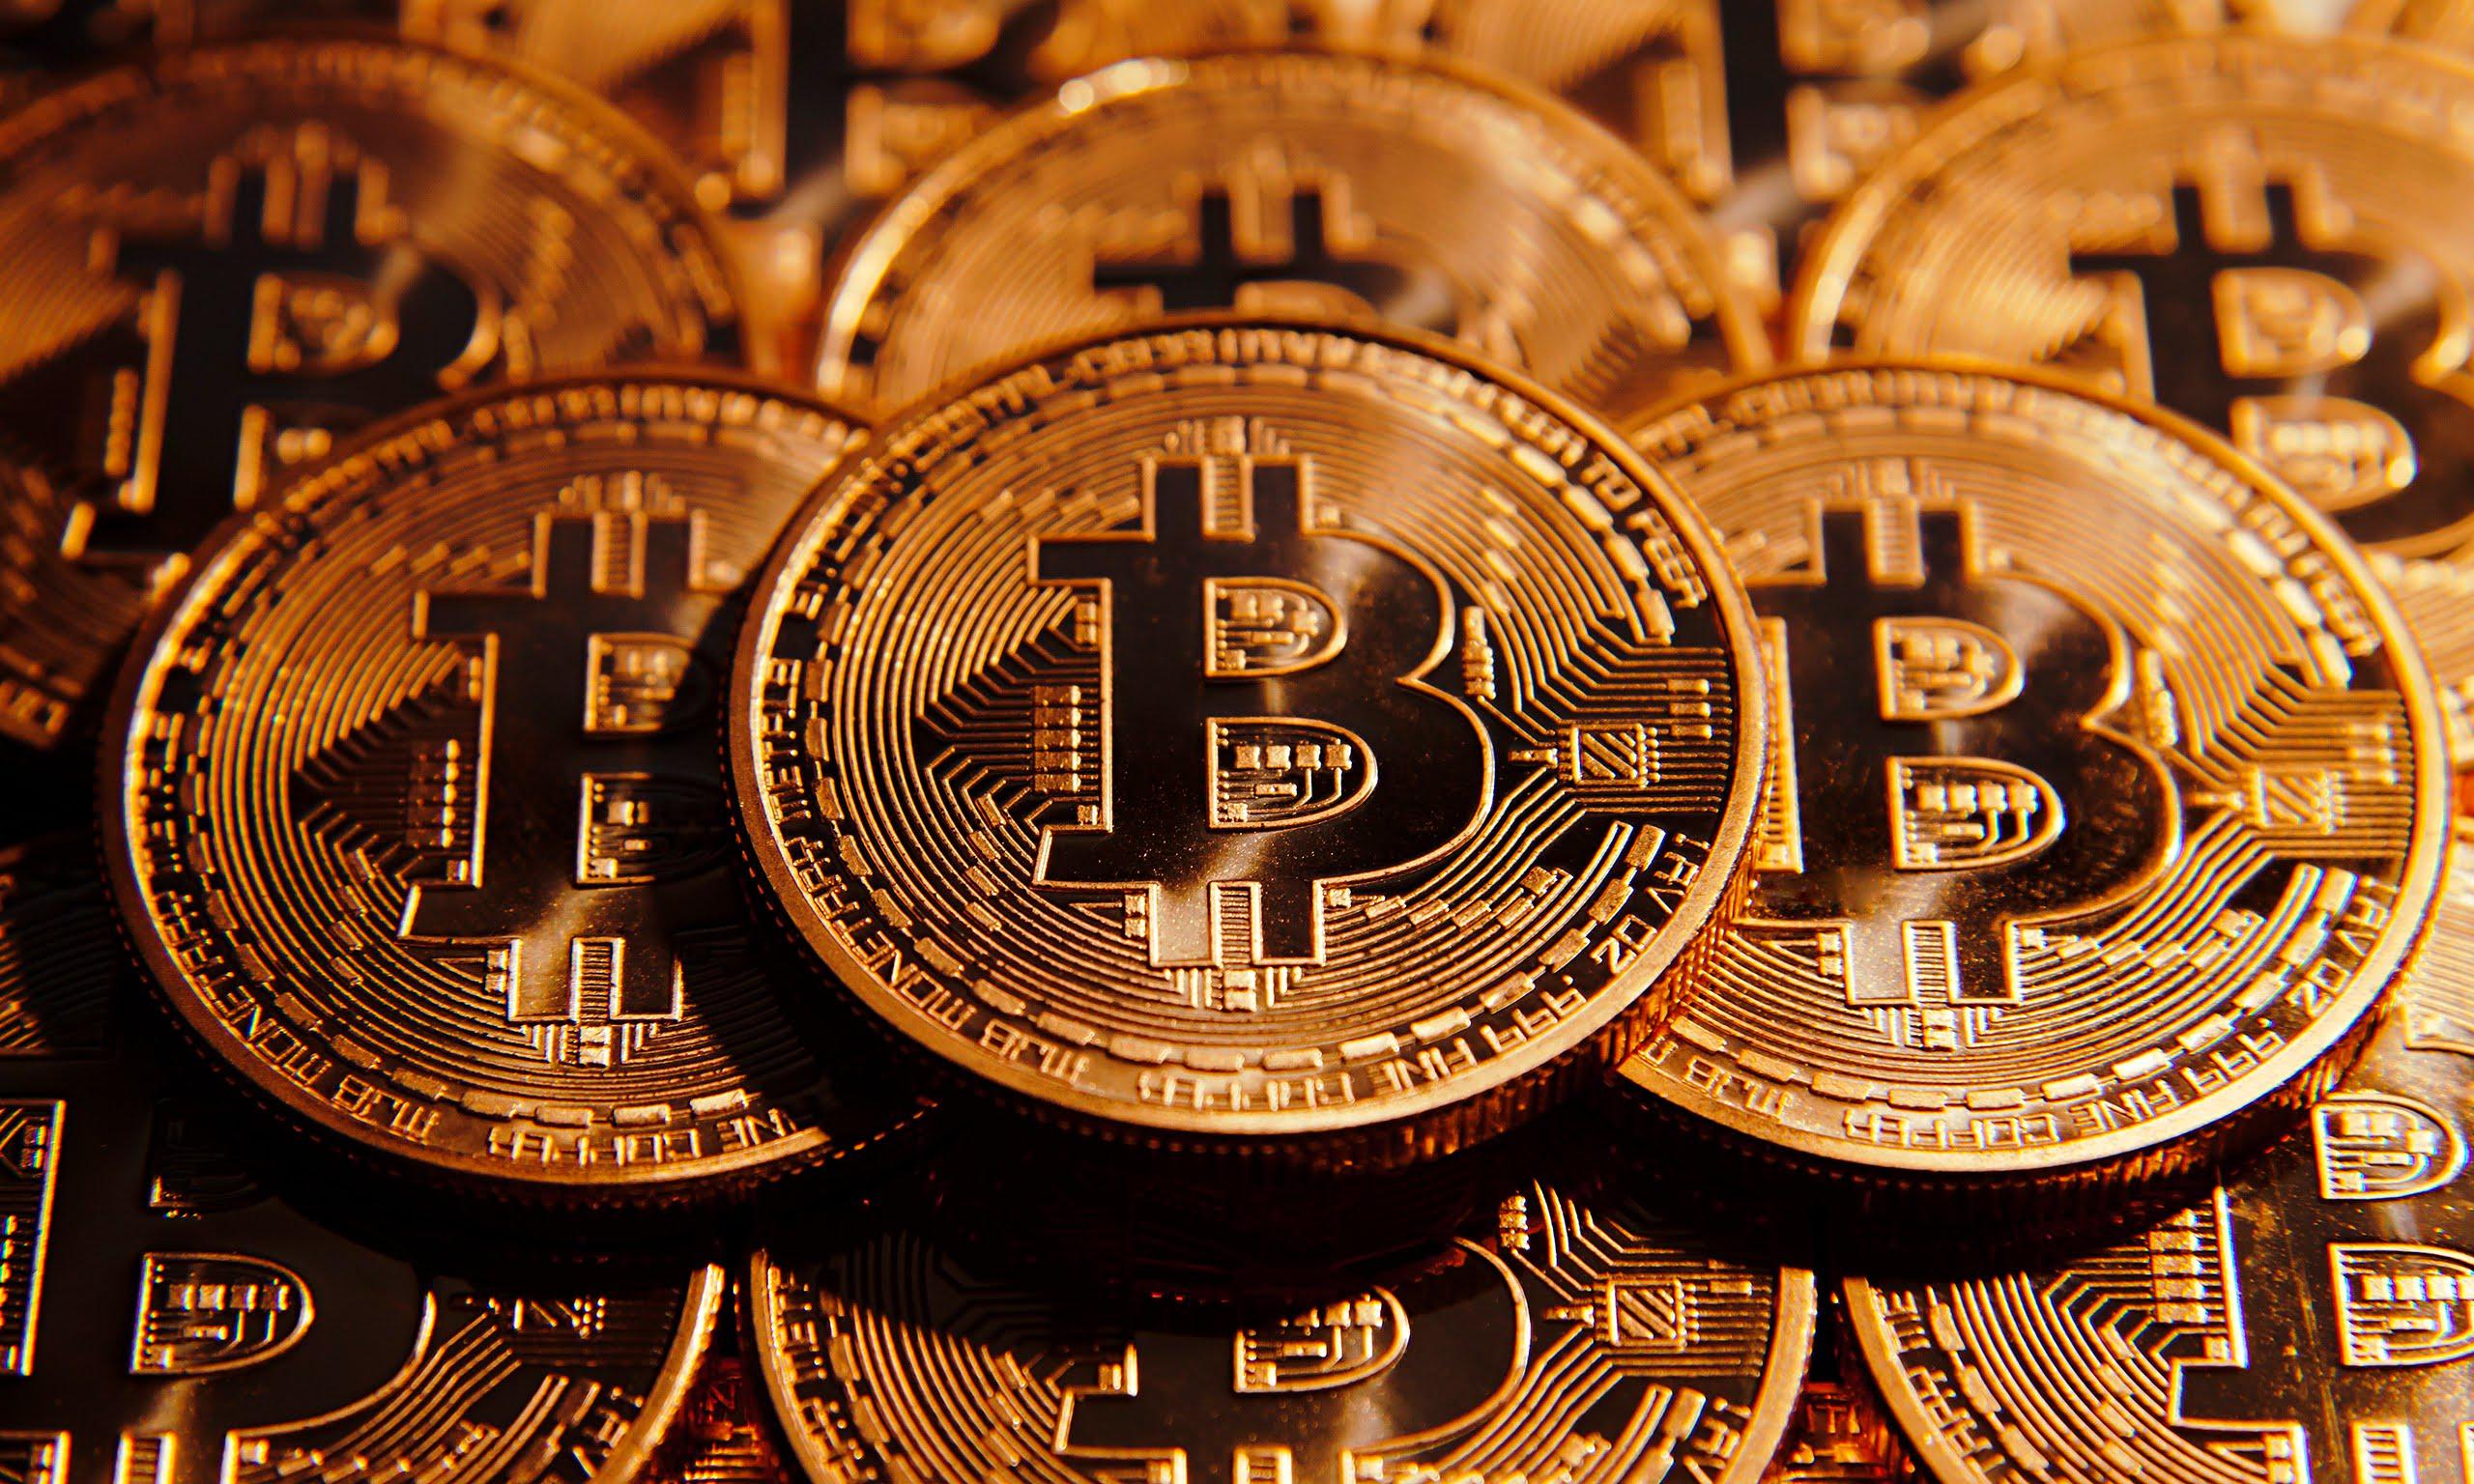 crypto king bear market aside bitcoin btc still has inherent